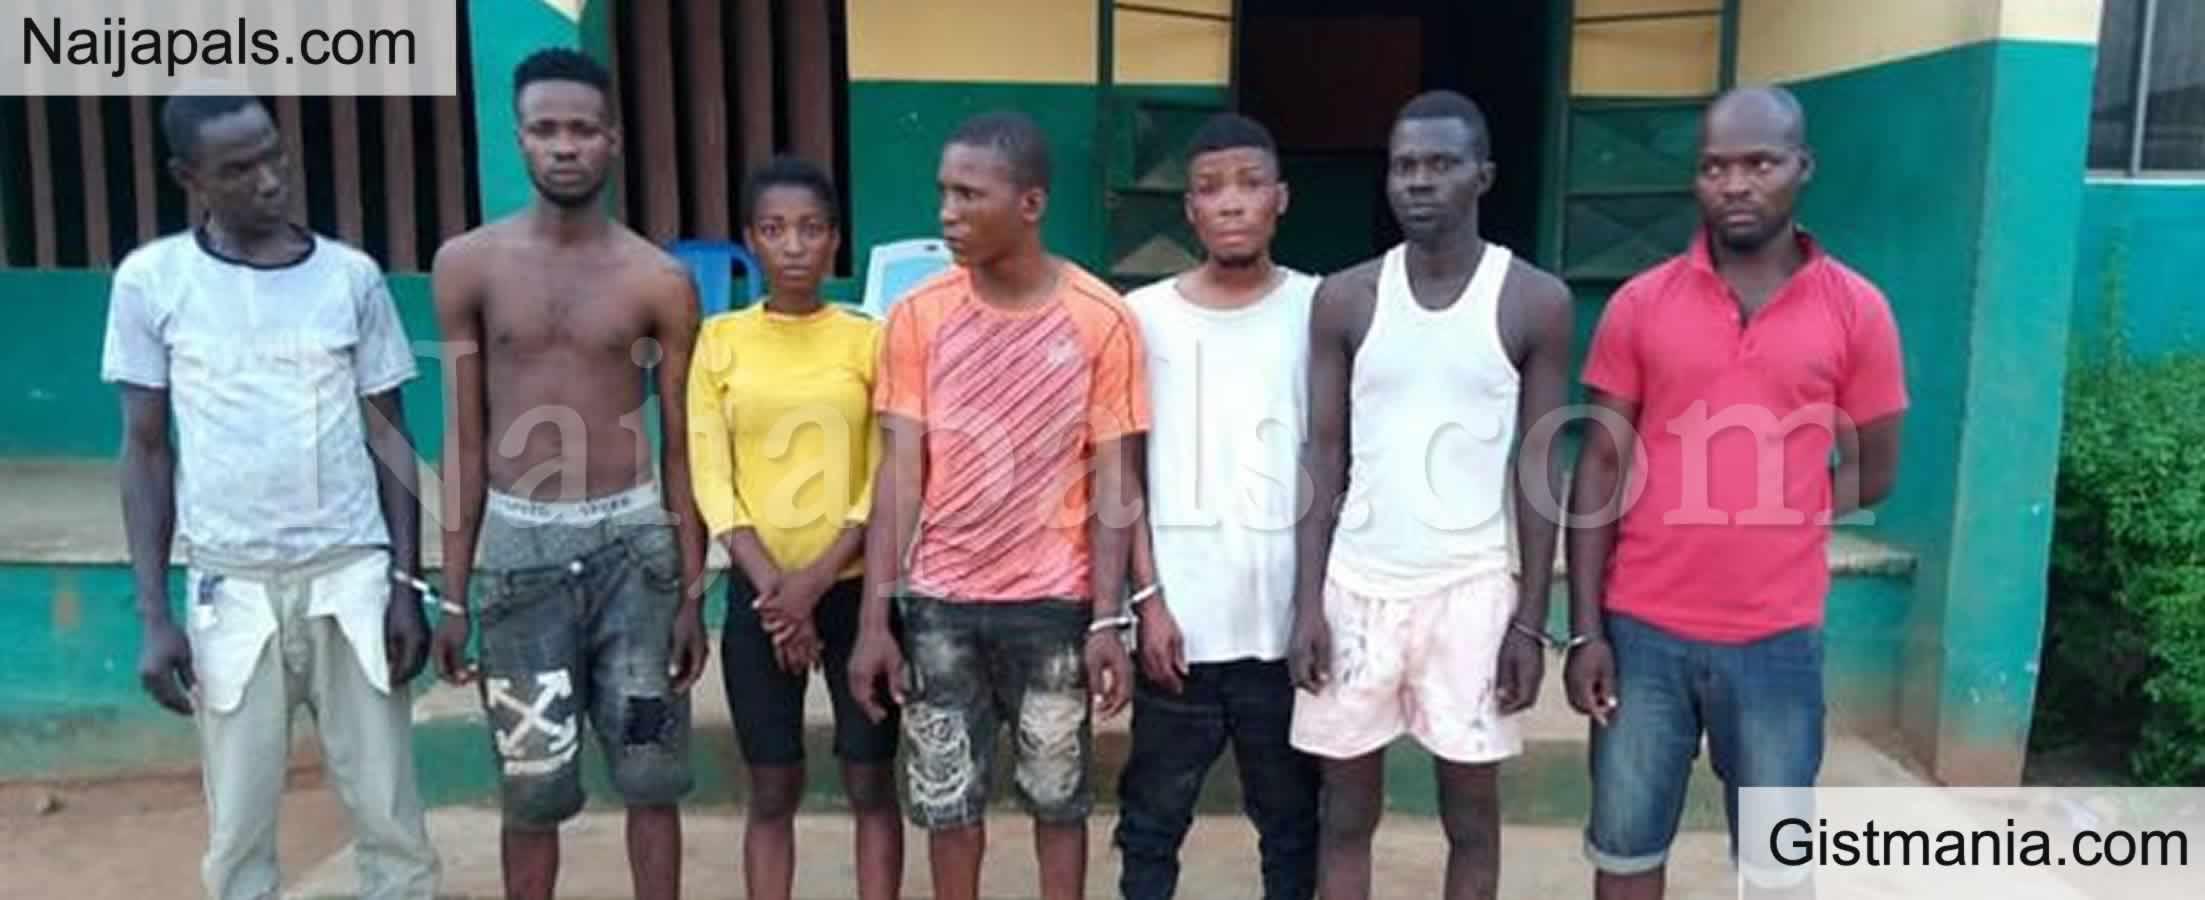 <img alt='.' class='lazyload' data-src='https://img.gistmania.com/emot/news.gif' /> <b>Lagos Police Arrest 7 Suspected Cultists</b> (Photo)